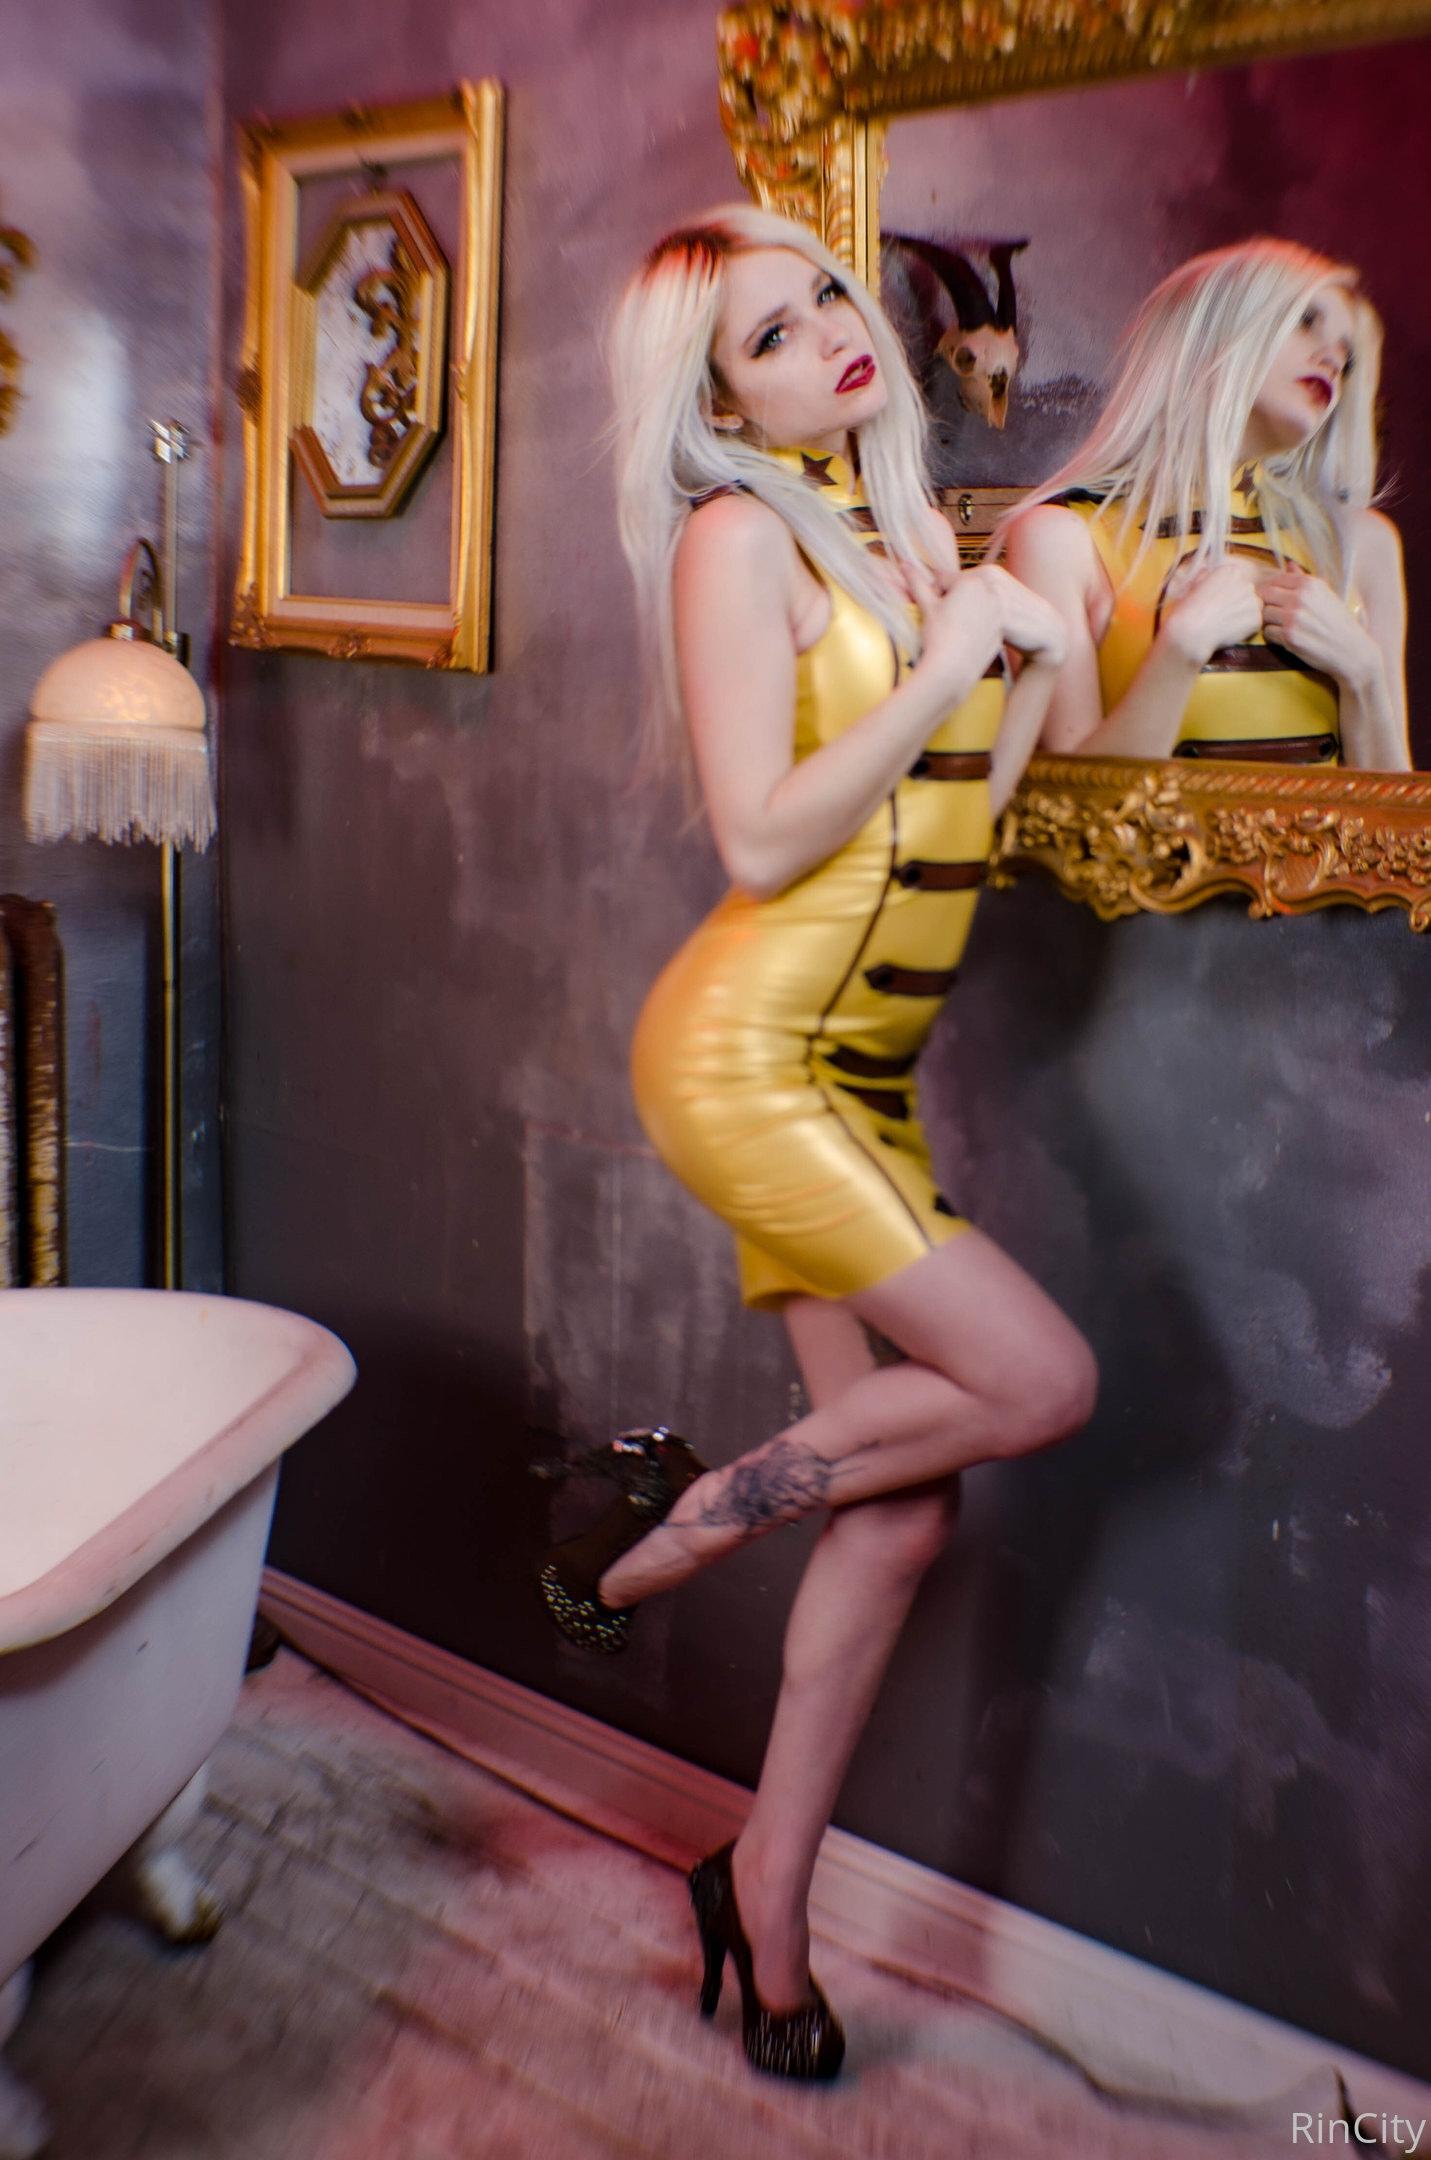 Rin City) - Latex Dress